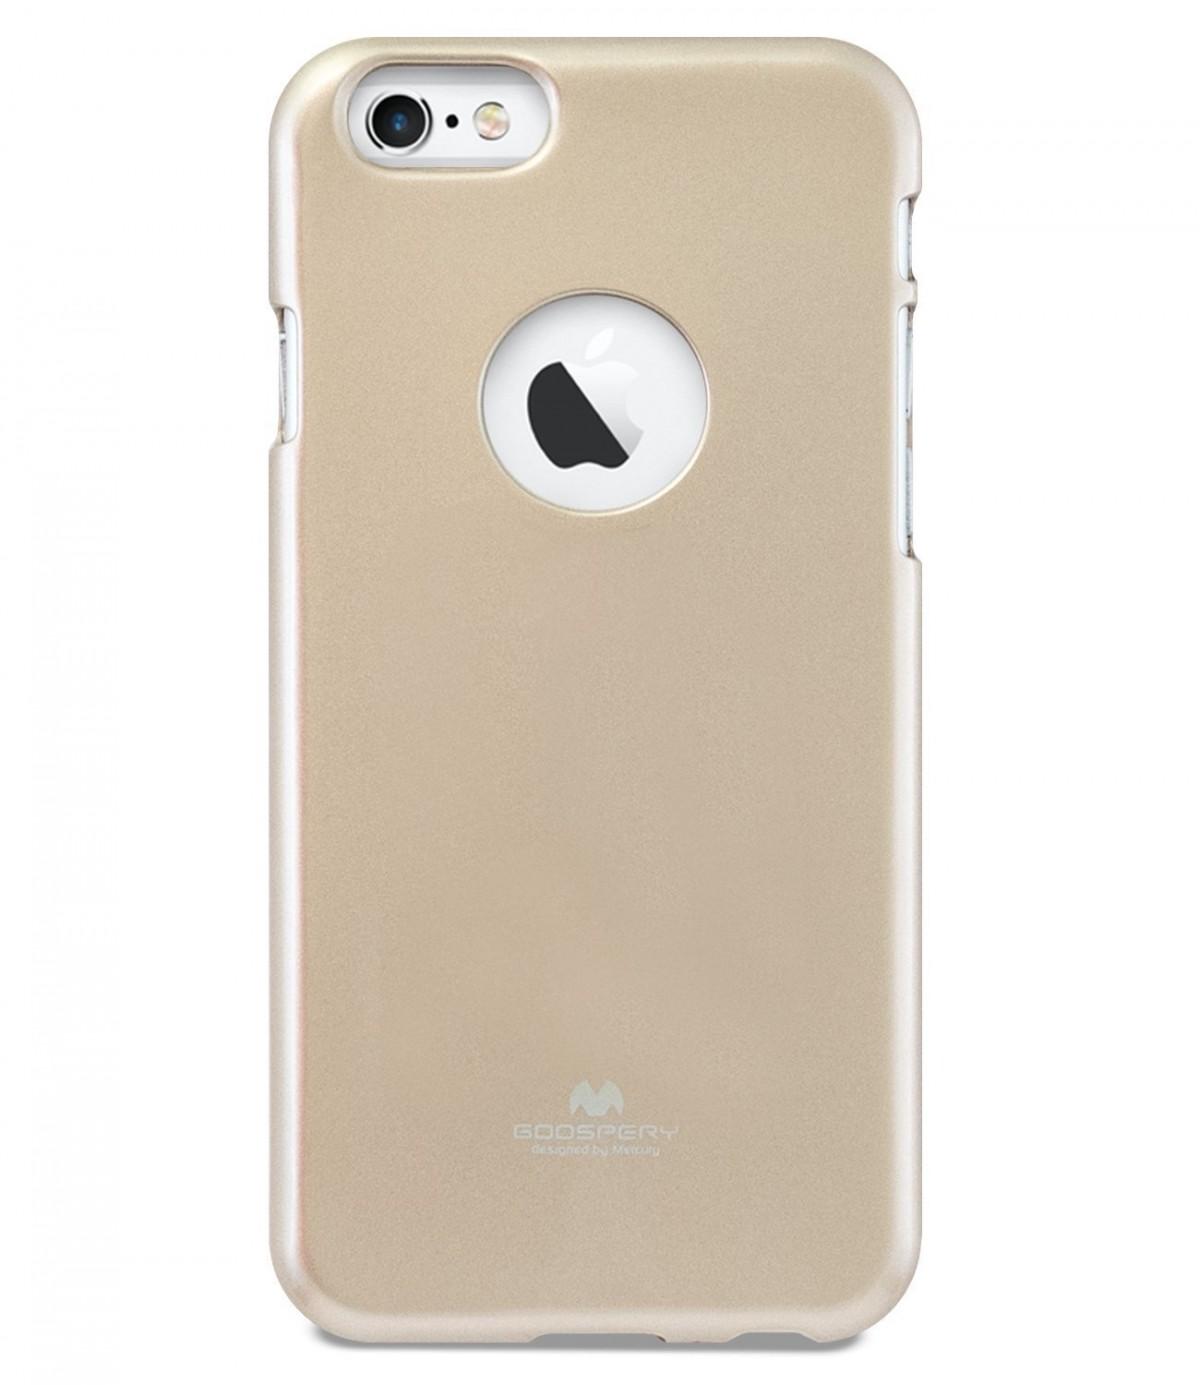 Tenké silikonové obaly / kryty Goospery Mercury pro Apple iPhone 6s/6 - Zlatý / Gold